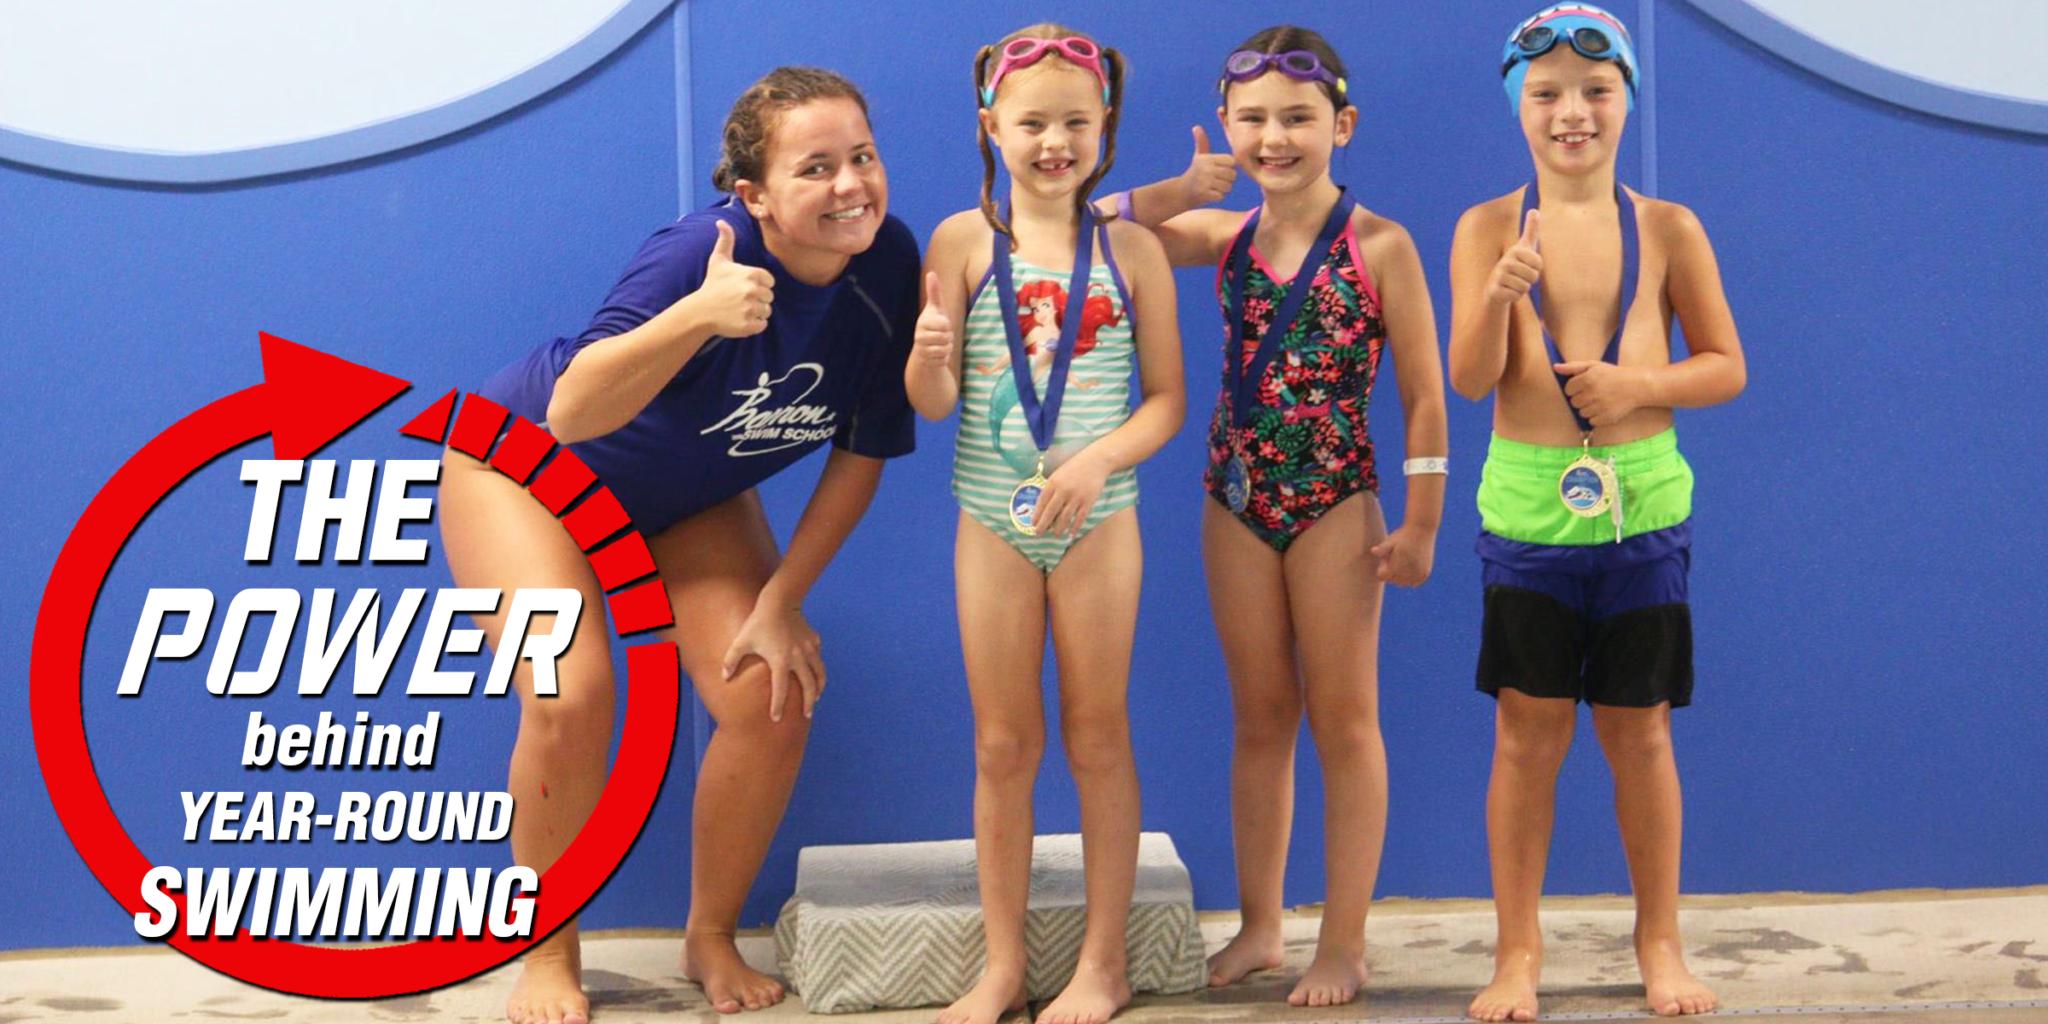 The Power Behind Year-Round Swimming